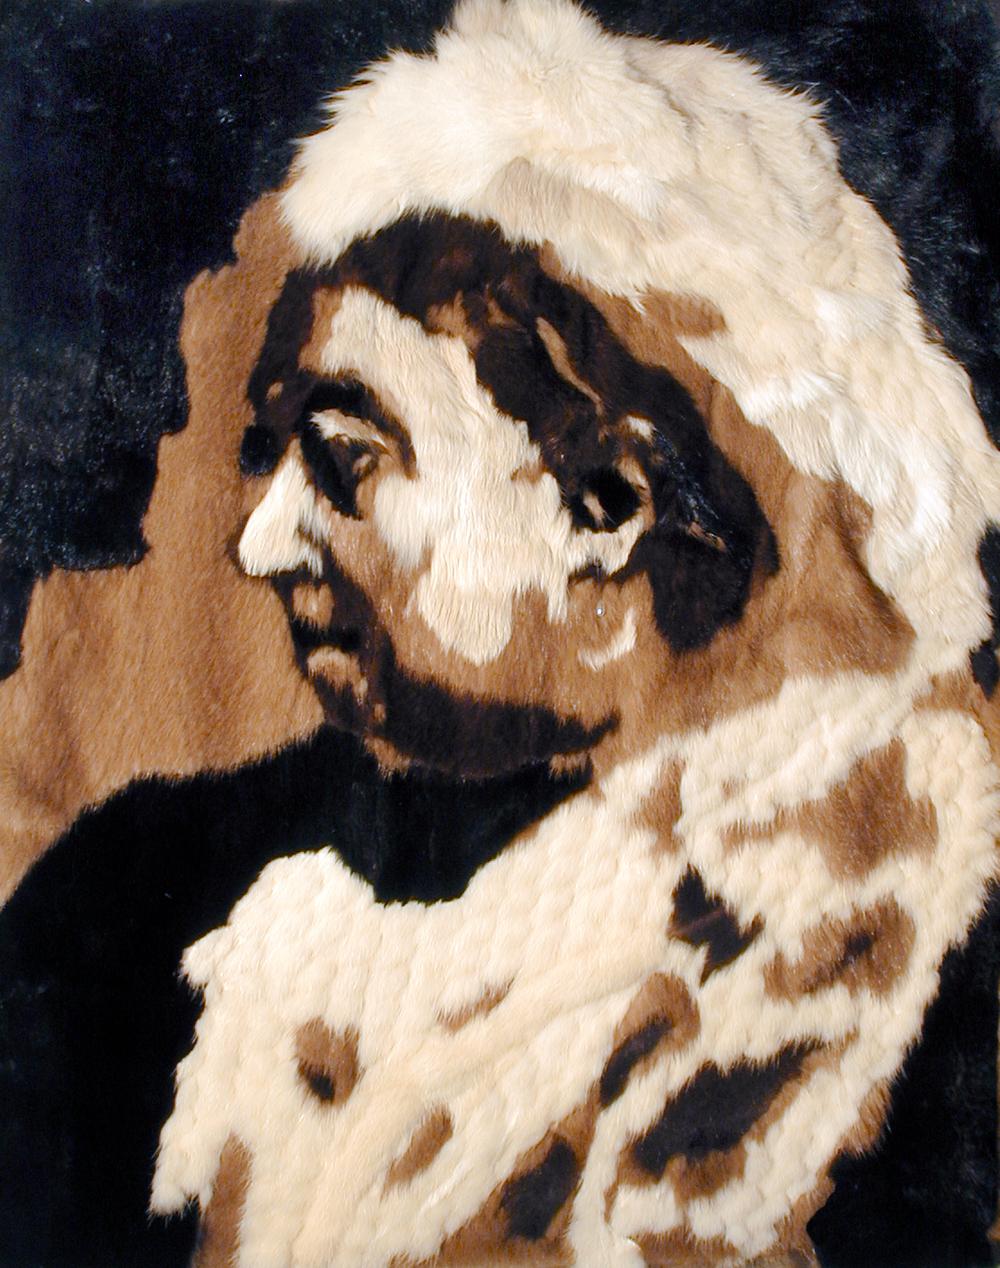 Fur Queen Victoria